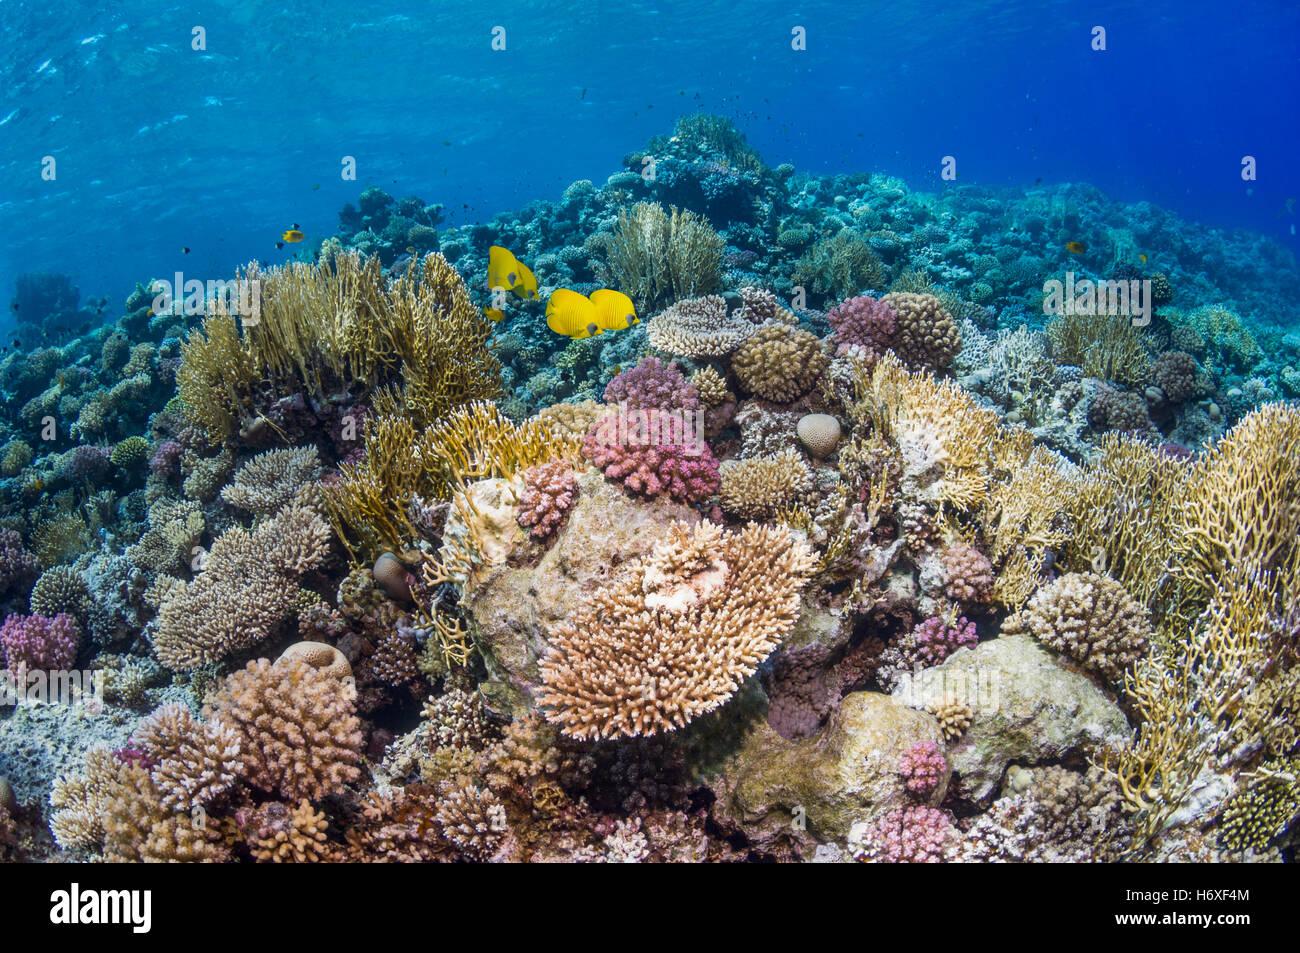 Spitze der Korallenriff mit goldenen Butterflyfish [Chaetodontidae Semilarvatus].  Ägypten, Rotes Meer. Stockbild